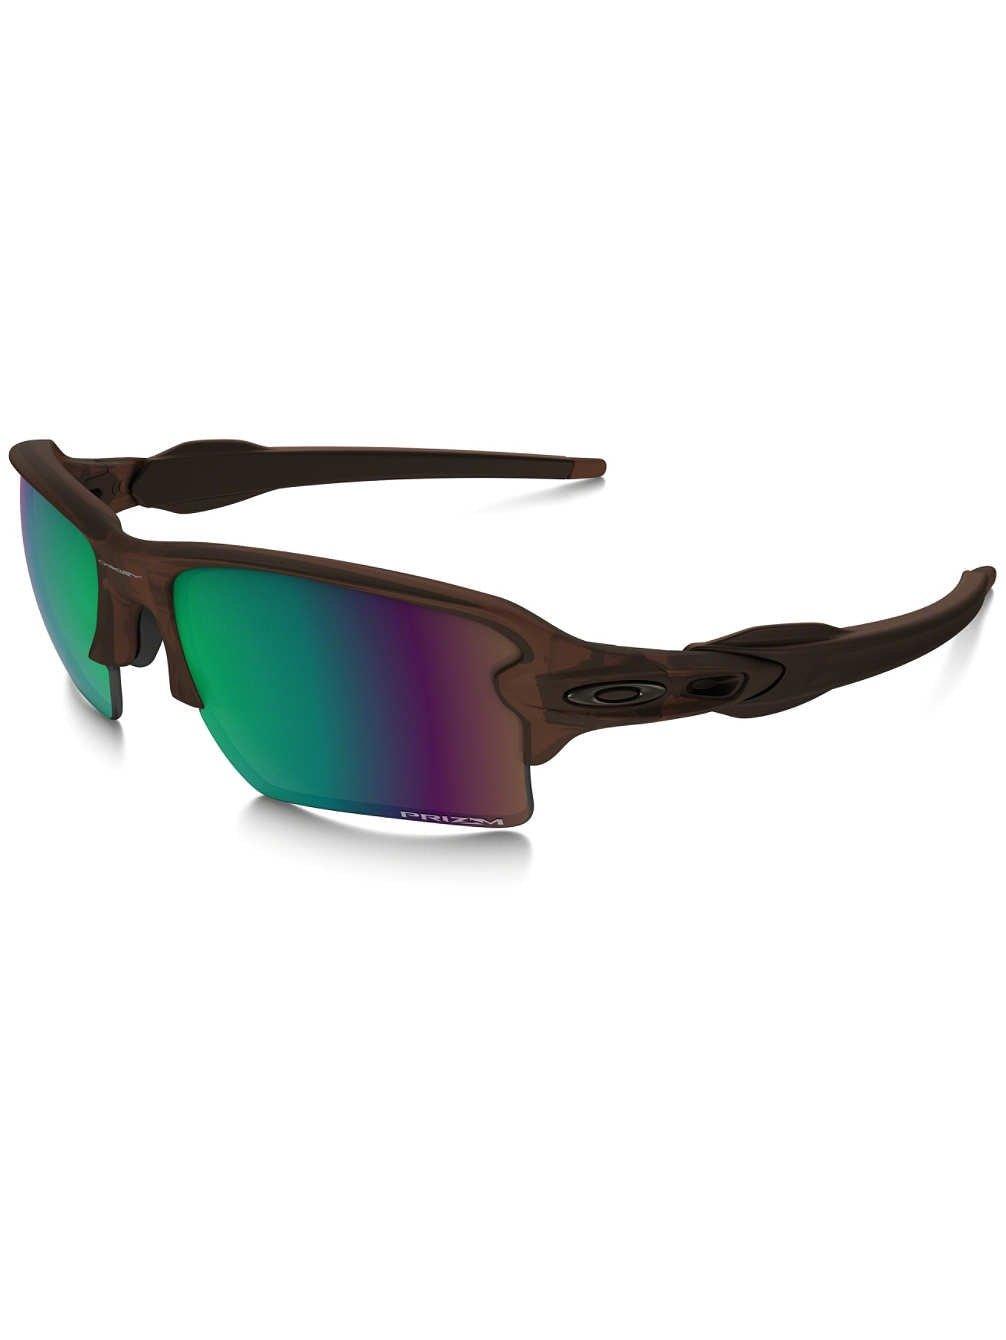 Oakley Men's Flak 2.0 XL Polarized Iridium Rectangular Sunglasses, Matte Rootbeer, 59 mm